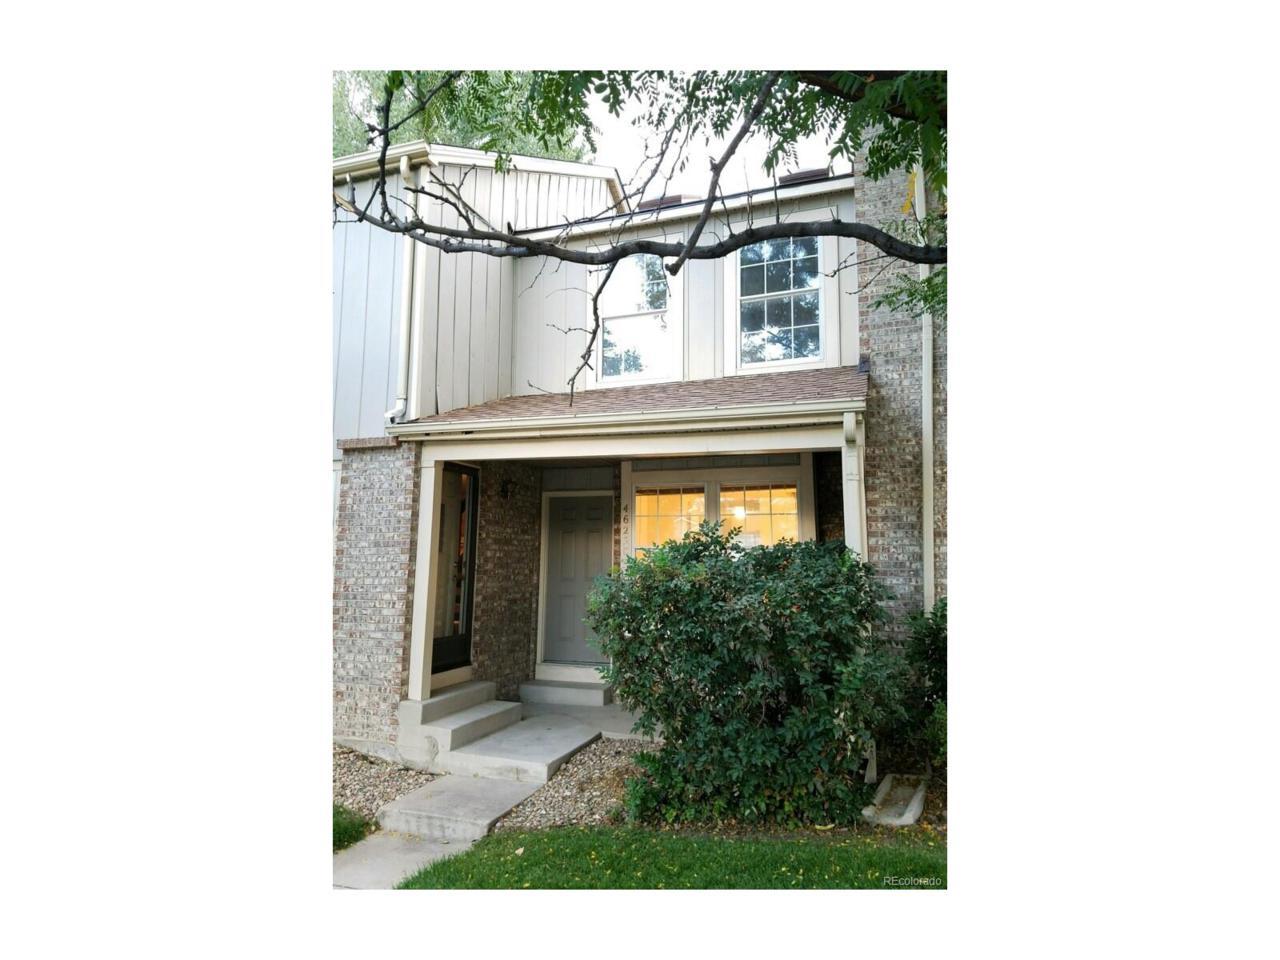 4623 S Crystal Way C199, Aurora, CO 80015 (MLS #9749359) :: 8z Real Estate